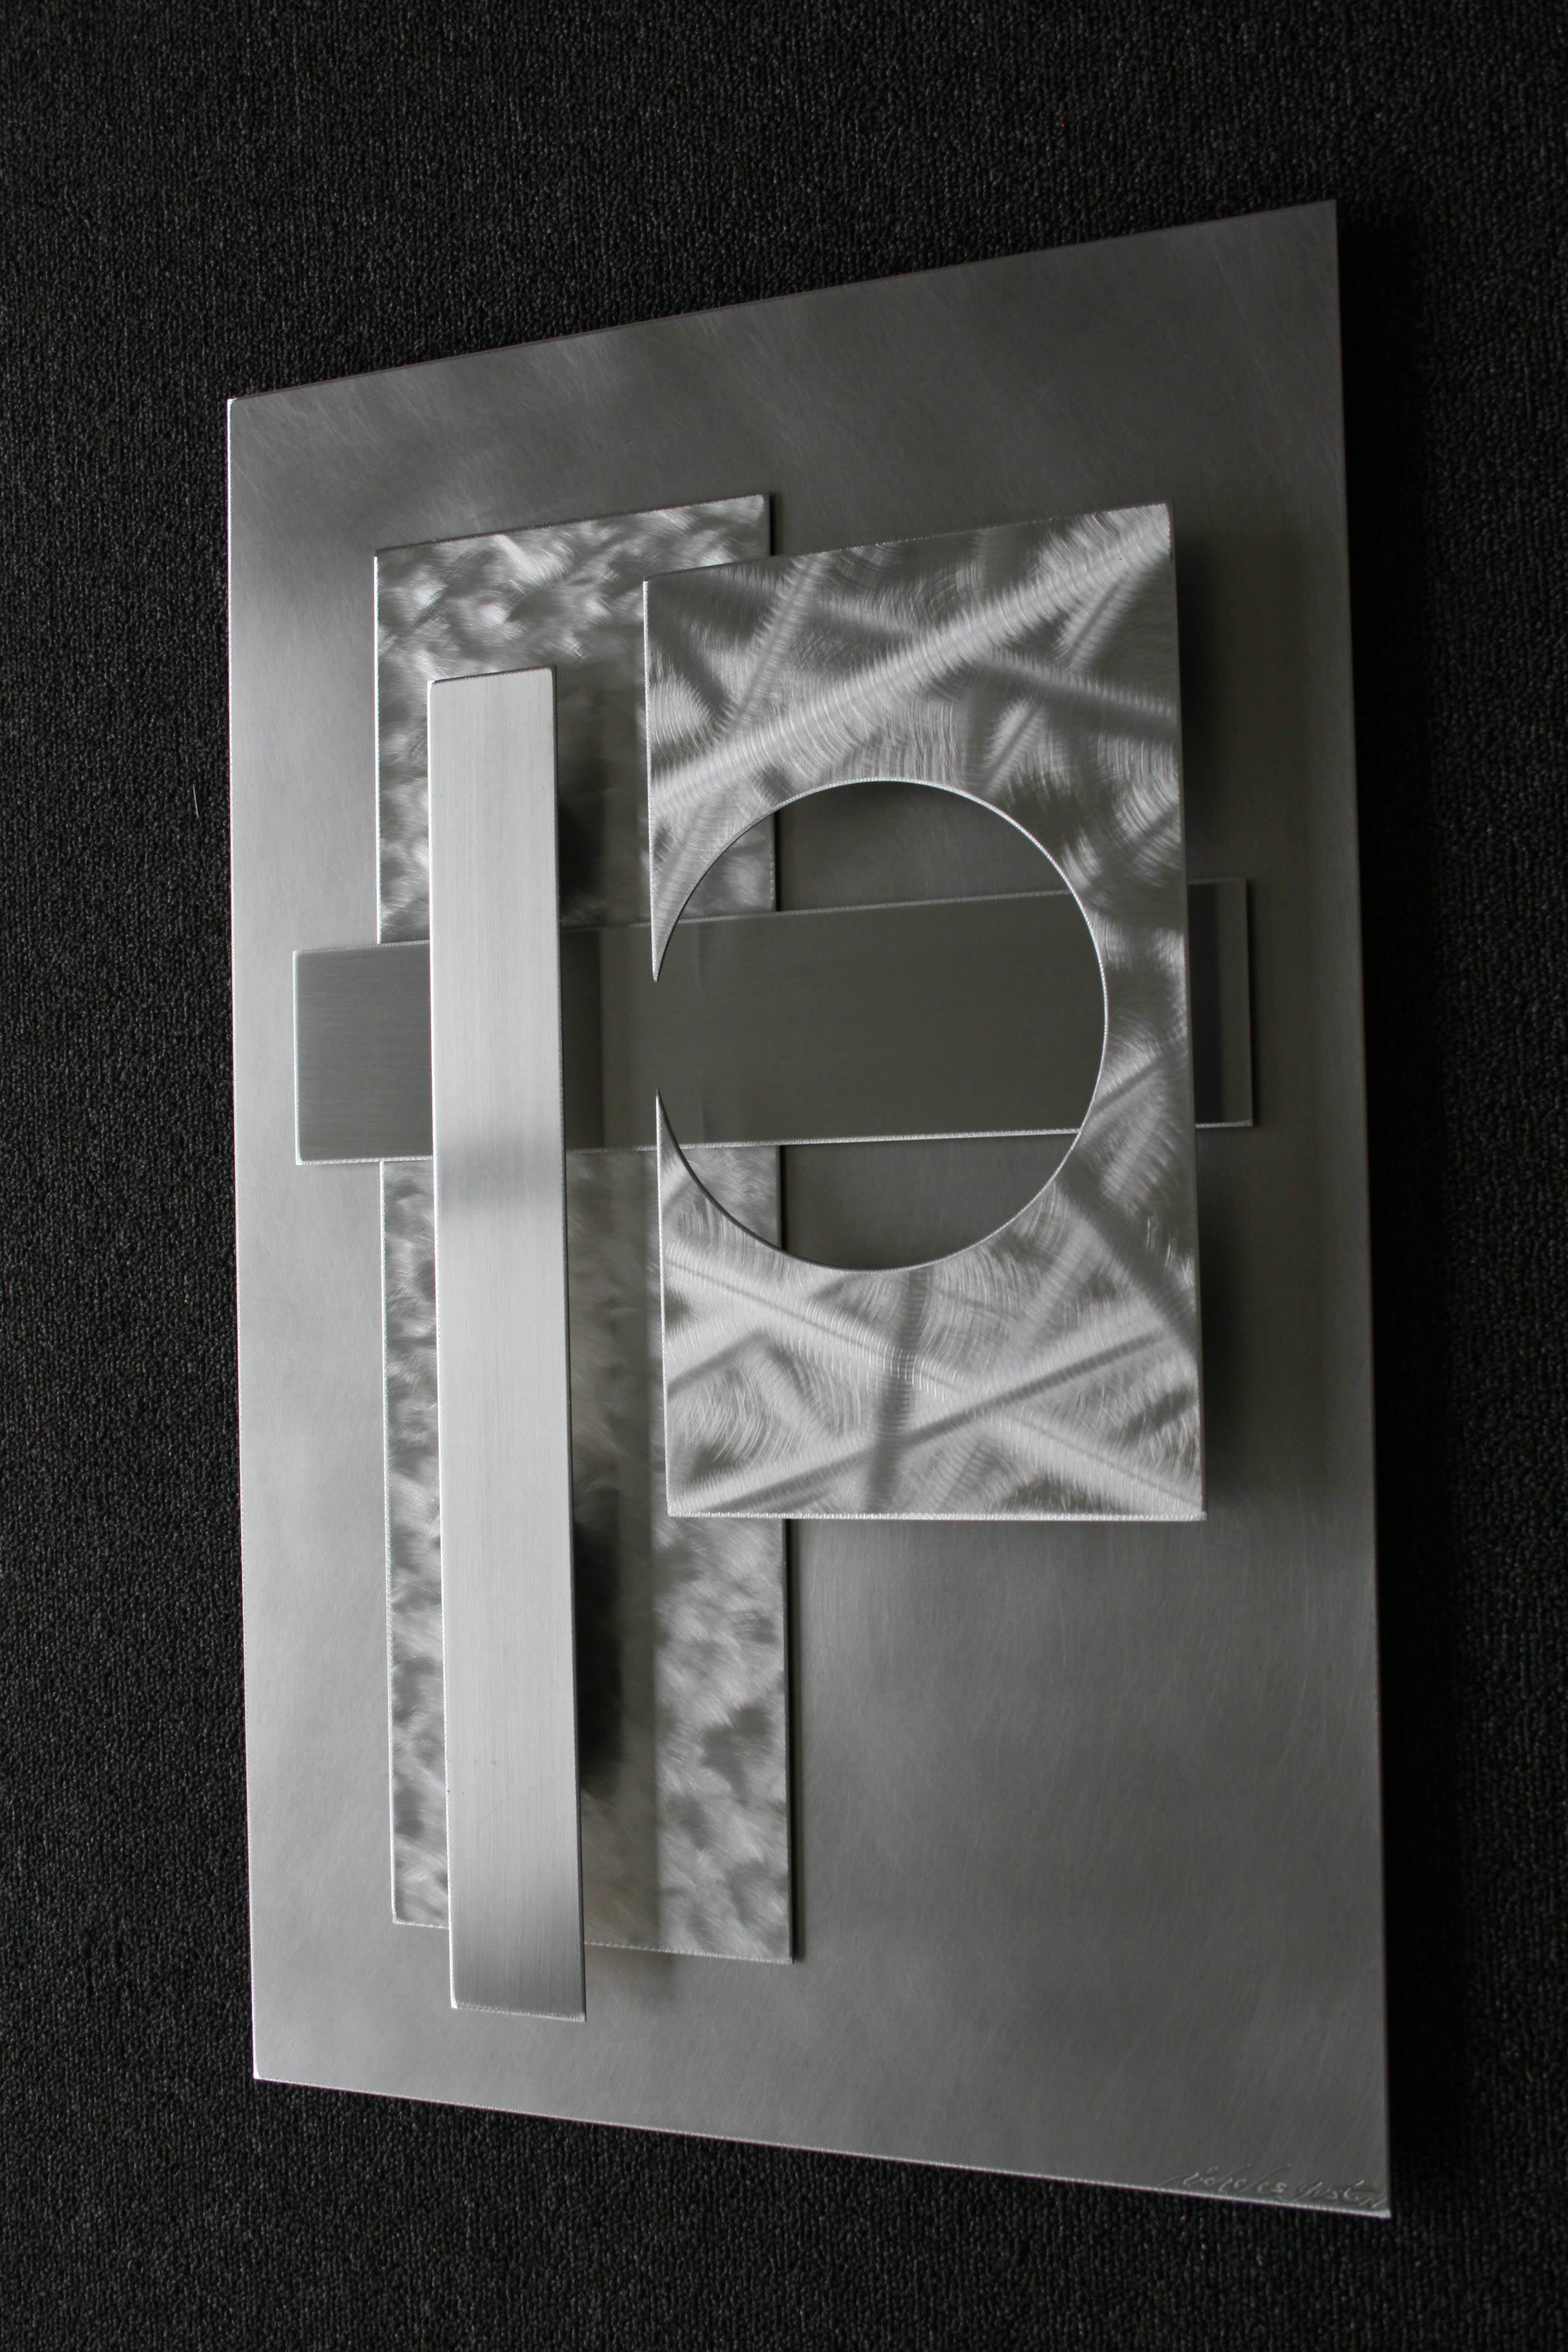 NY0492M - Metal Art by Nicholas Yust, Alternate Angle 1